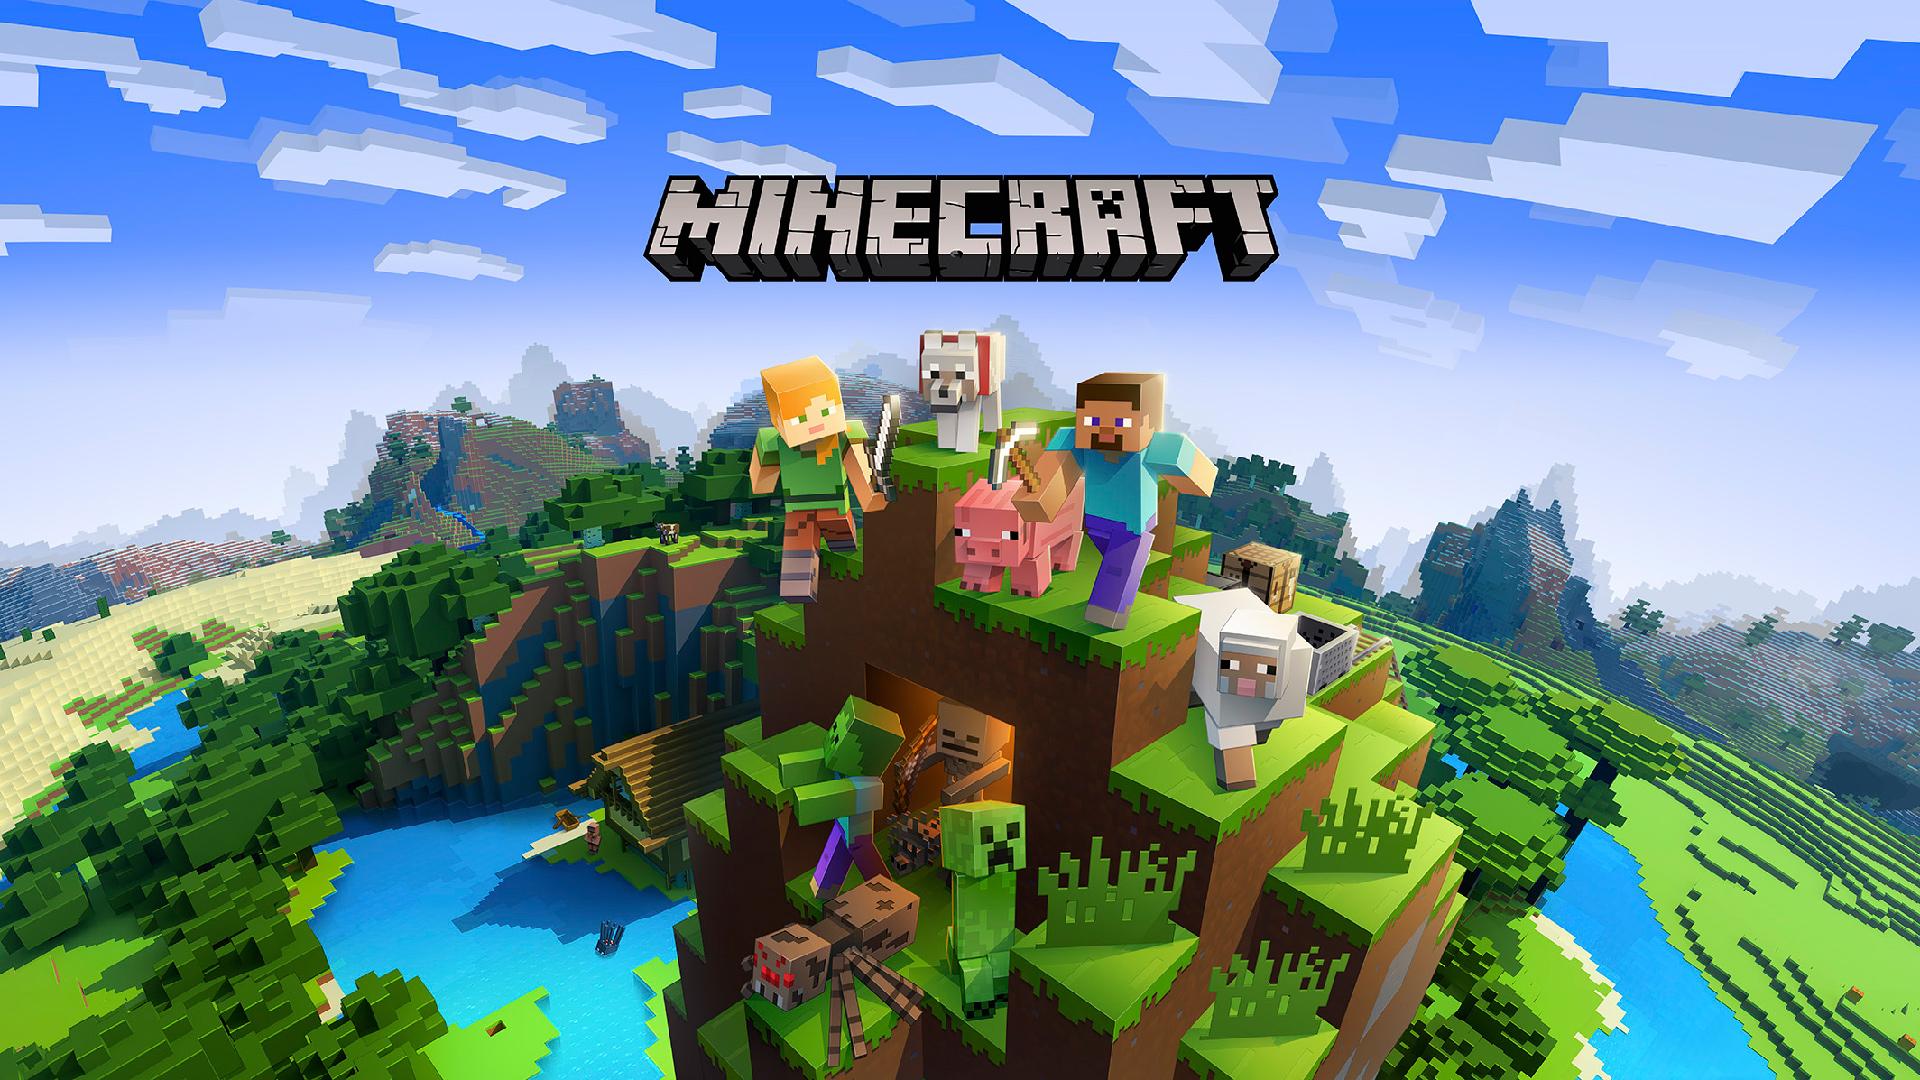 Xbox Game Pass will soon score Minecraft screenshot